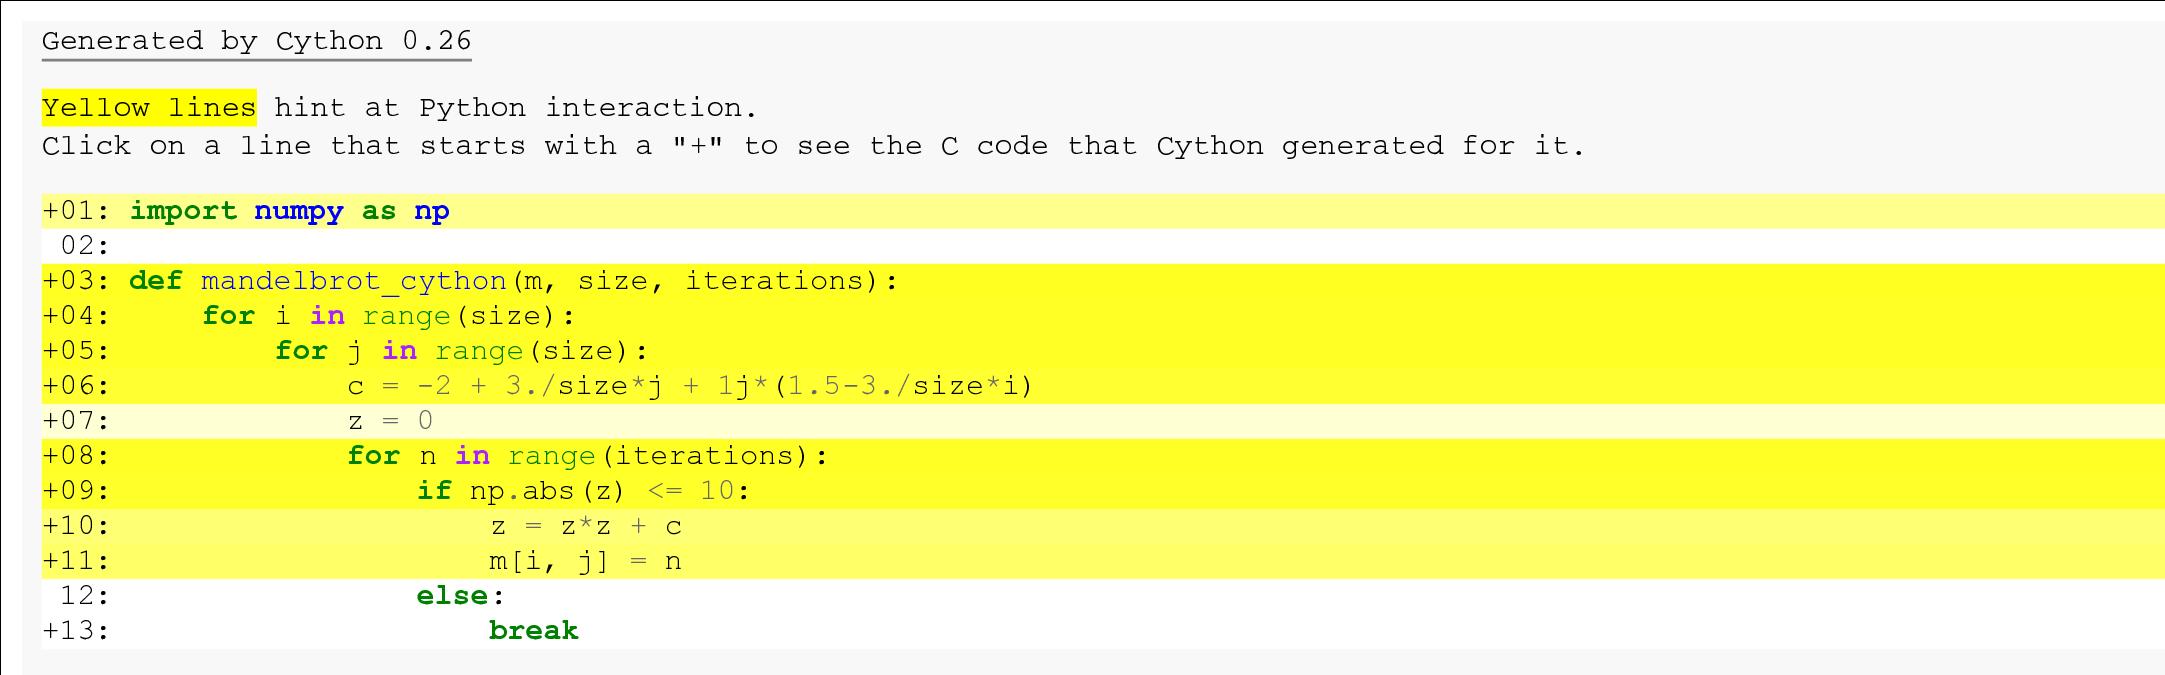 conda install cython